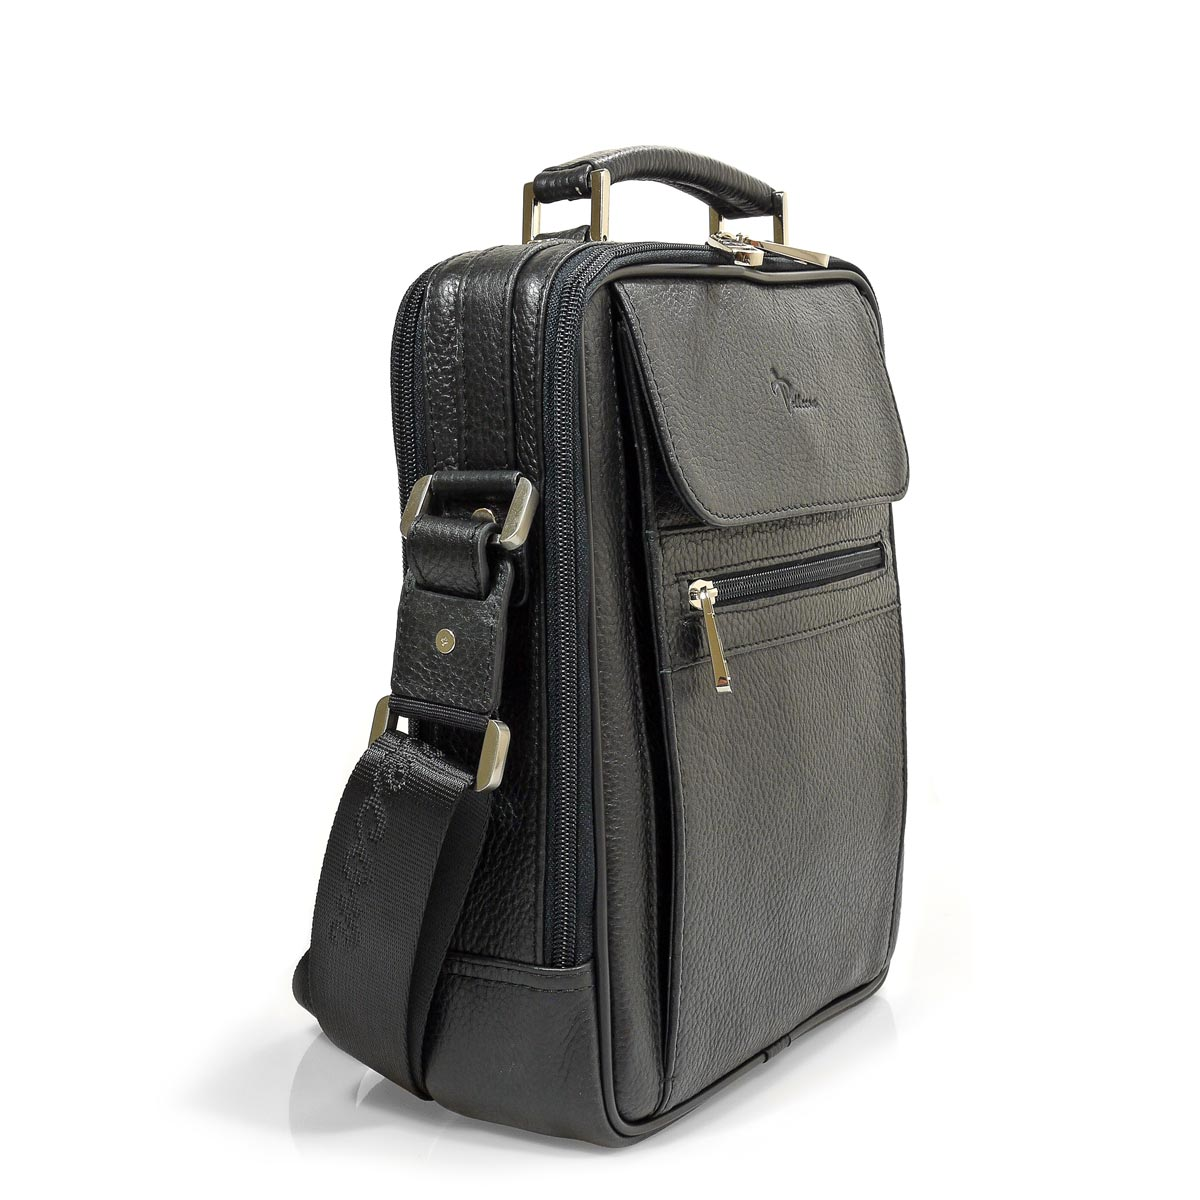 102-820-1 Men's Bag Pellekon